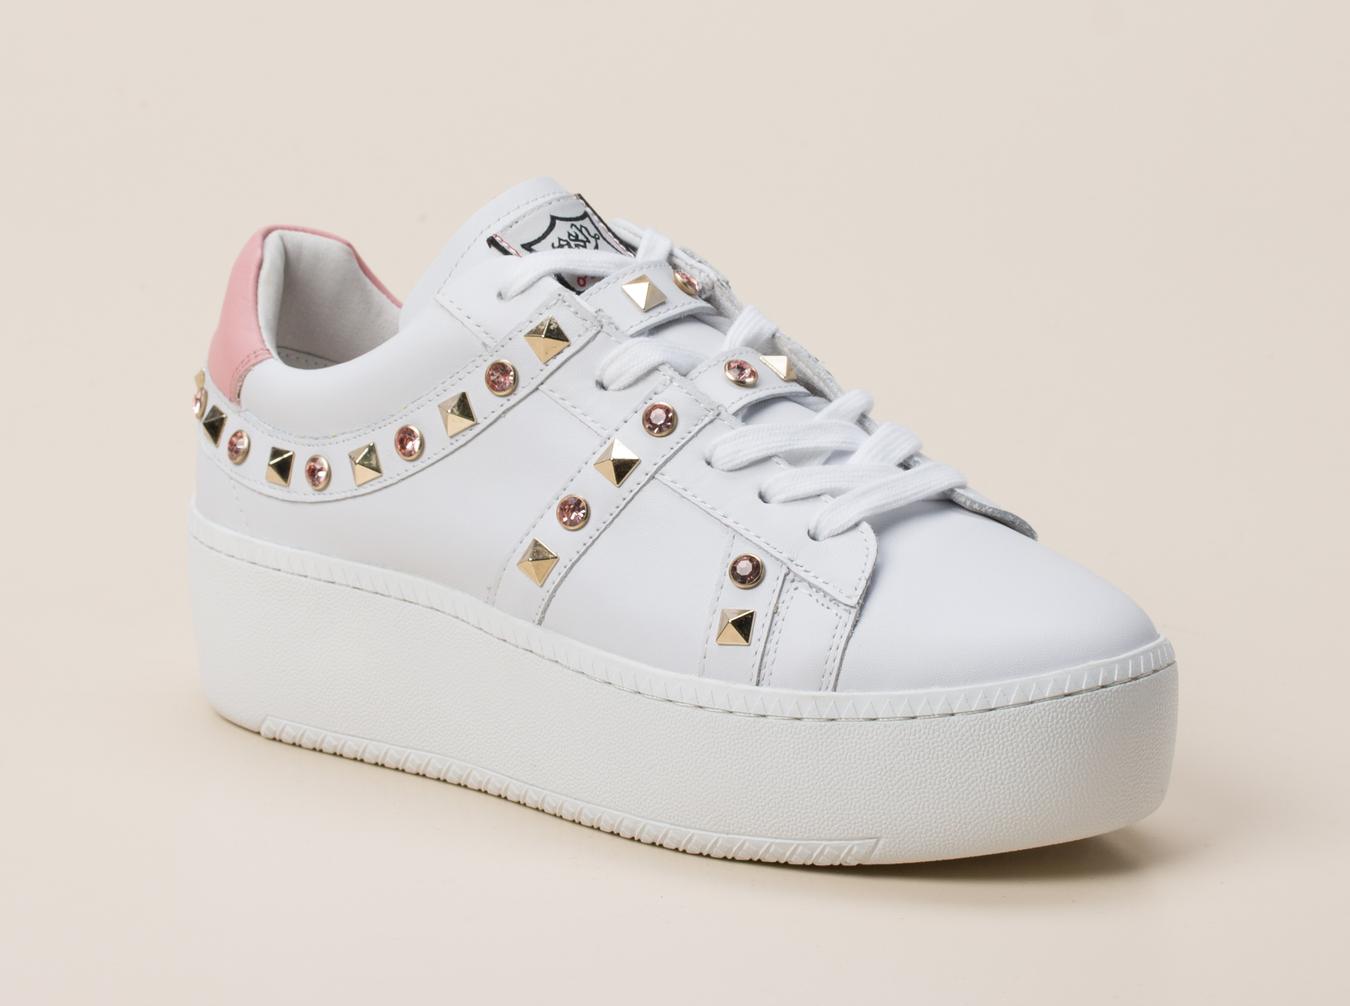 8e2f054019b81 ASH Damen Sneaker in weiß kaufen